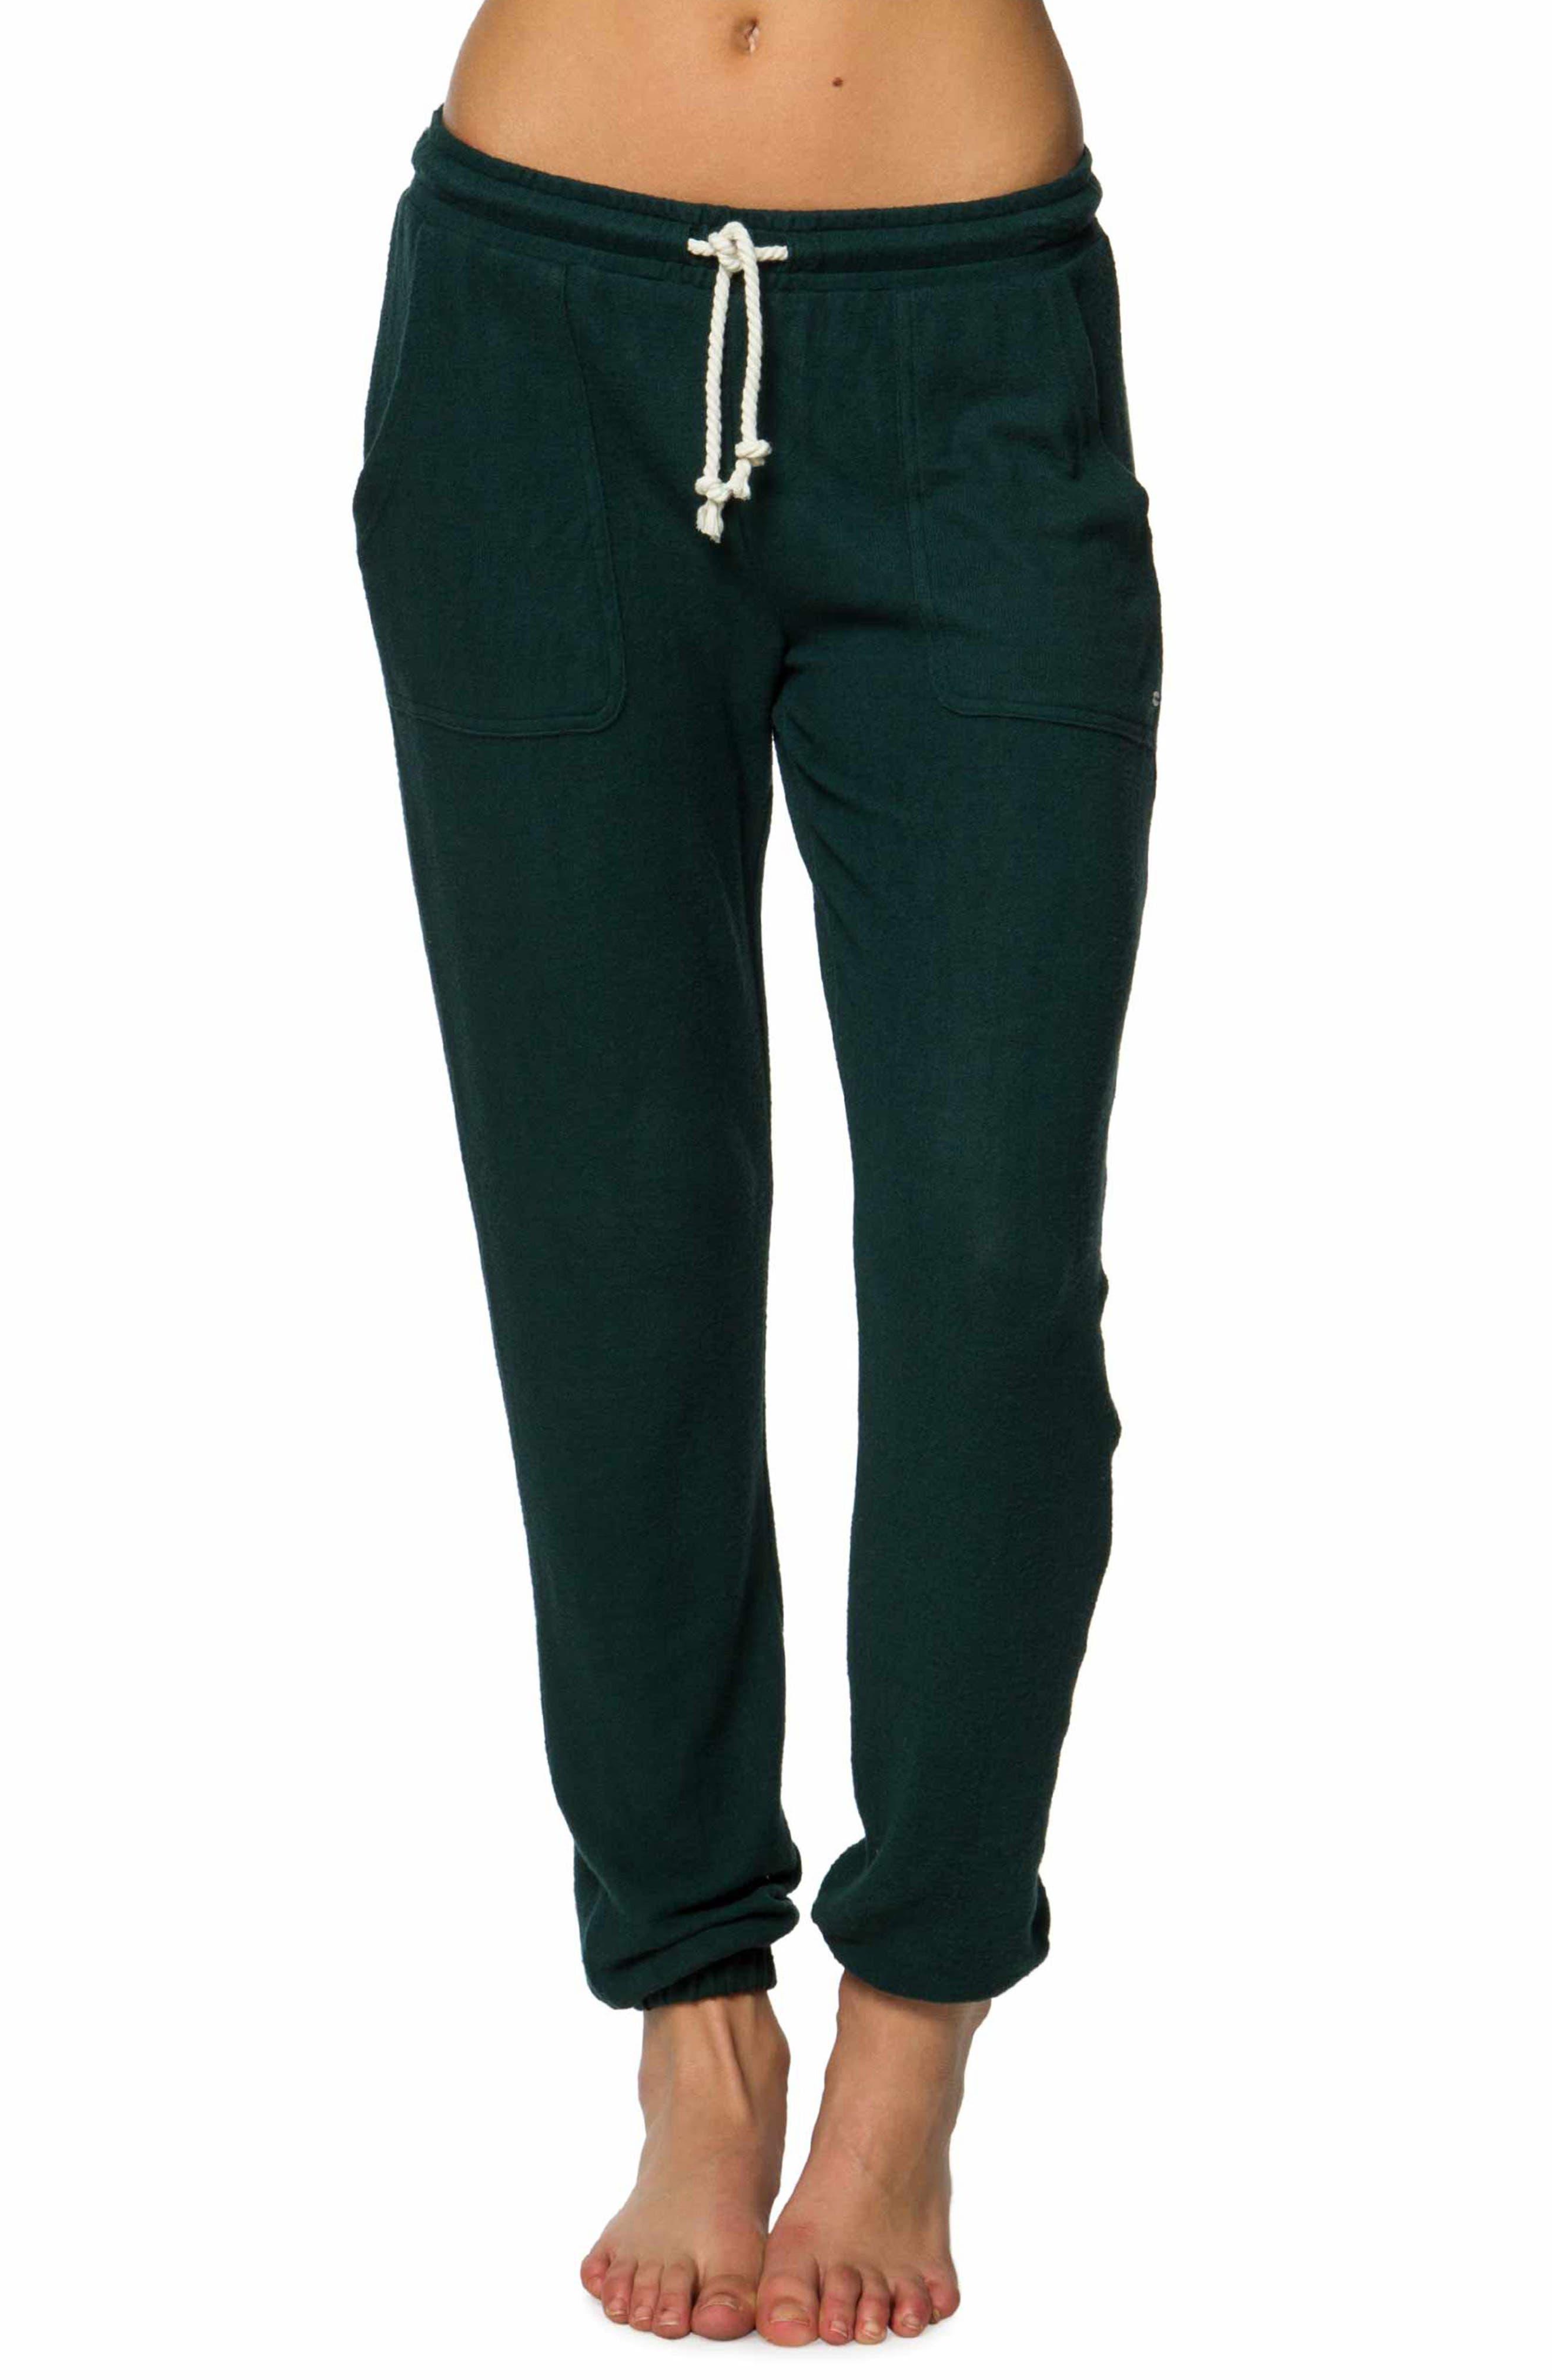 Alternate Image 1 Selected - O'Neill Jordin Fleece Pants